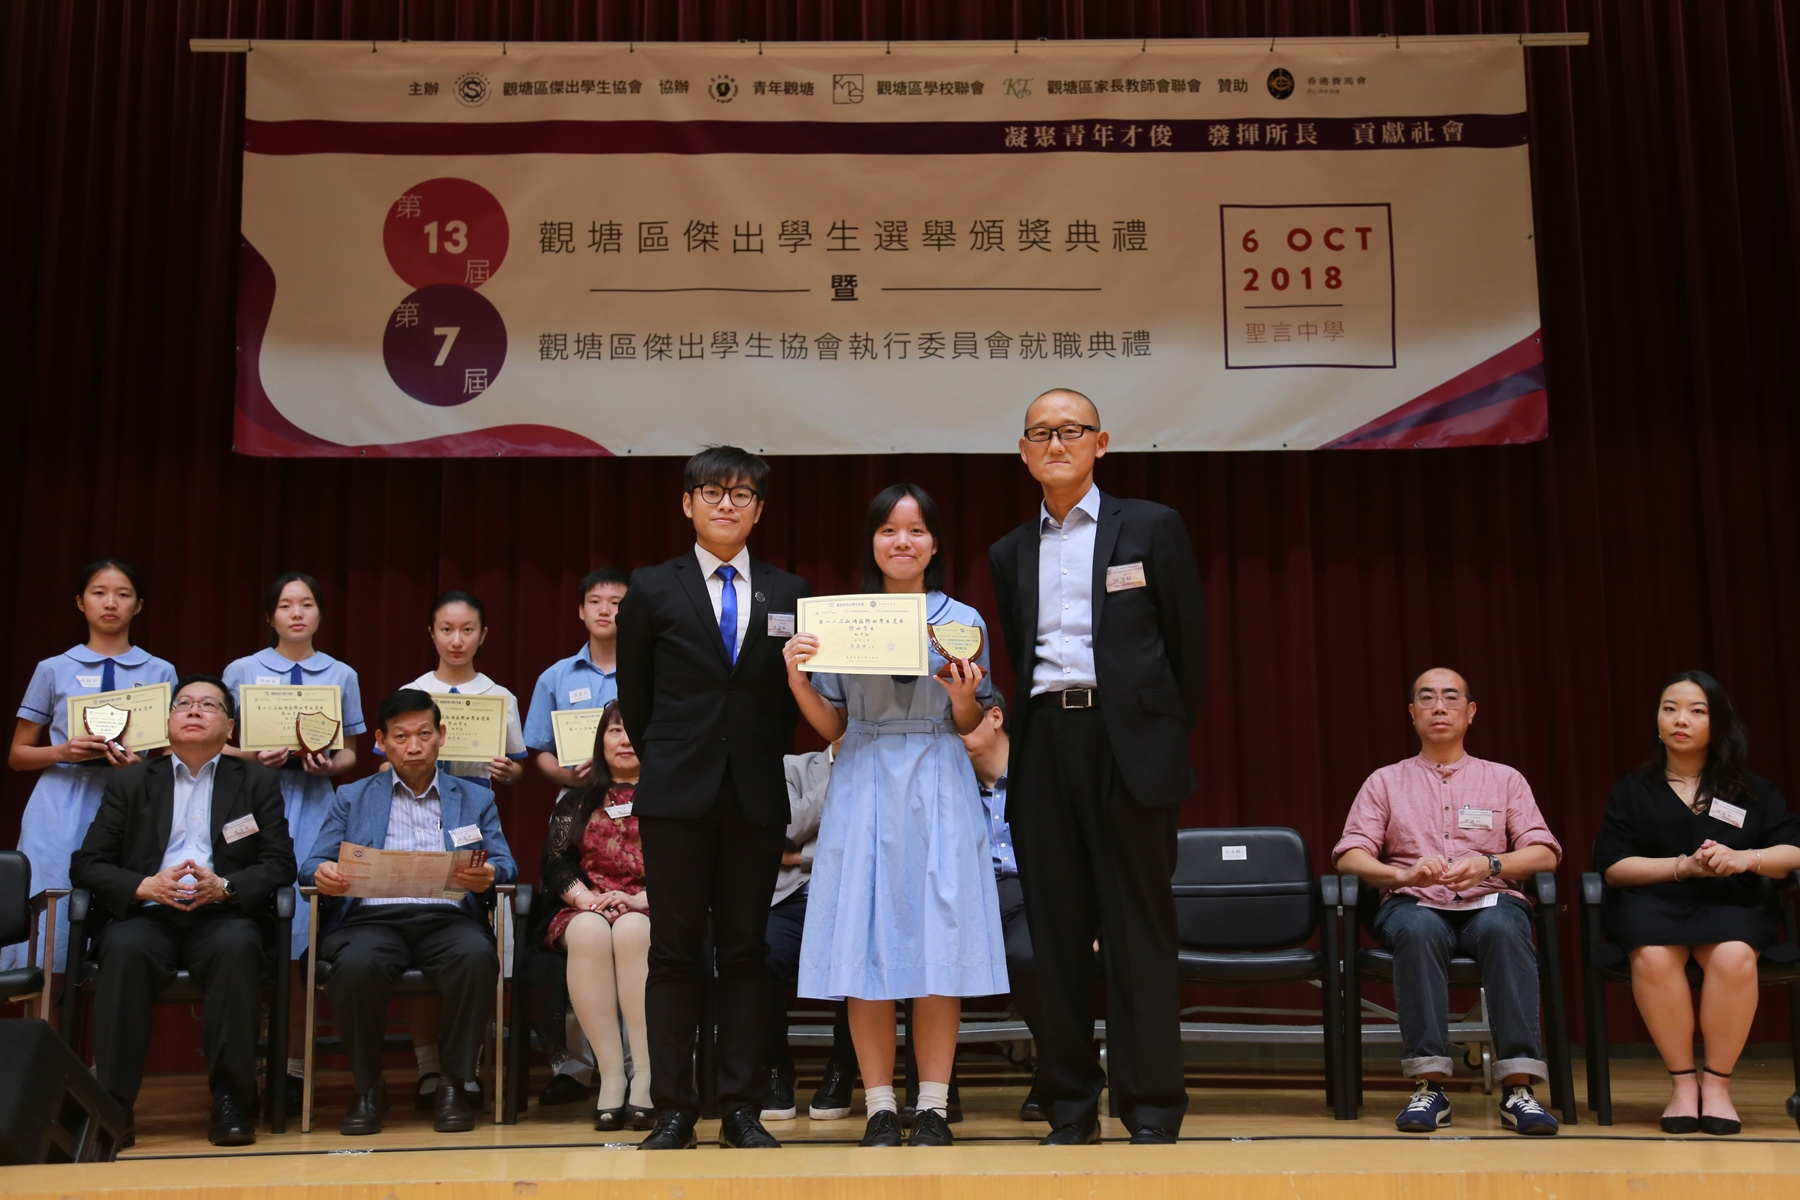 http://npc.edu.hk/sites/default/files/10801950816_img_0633.jpg